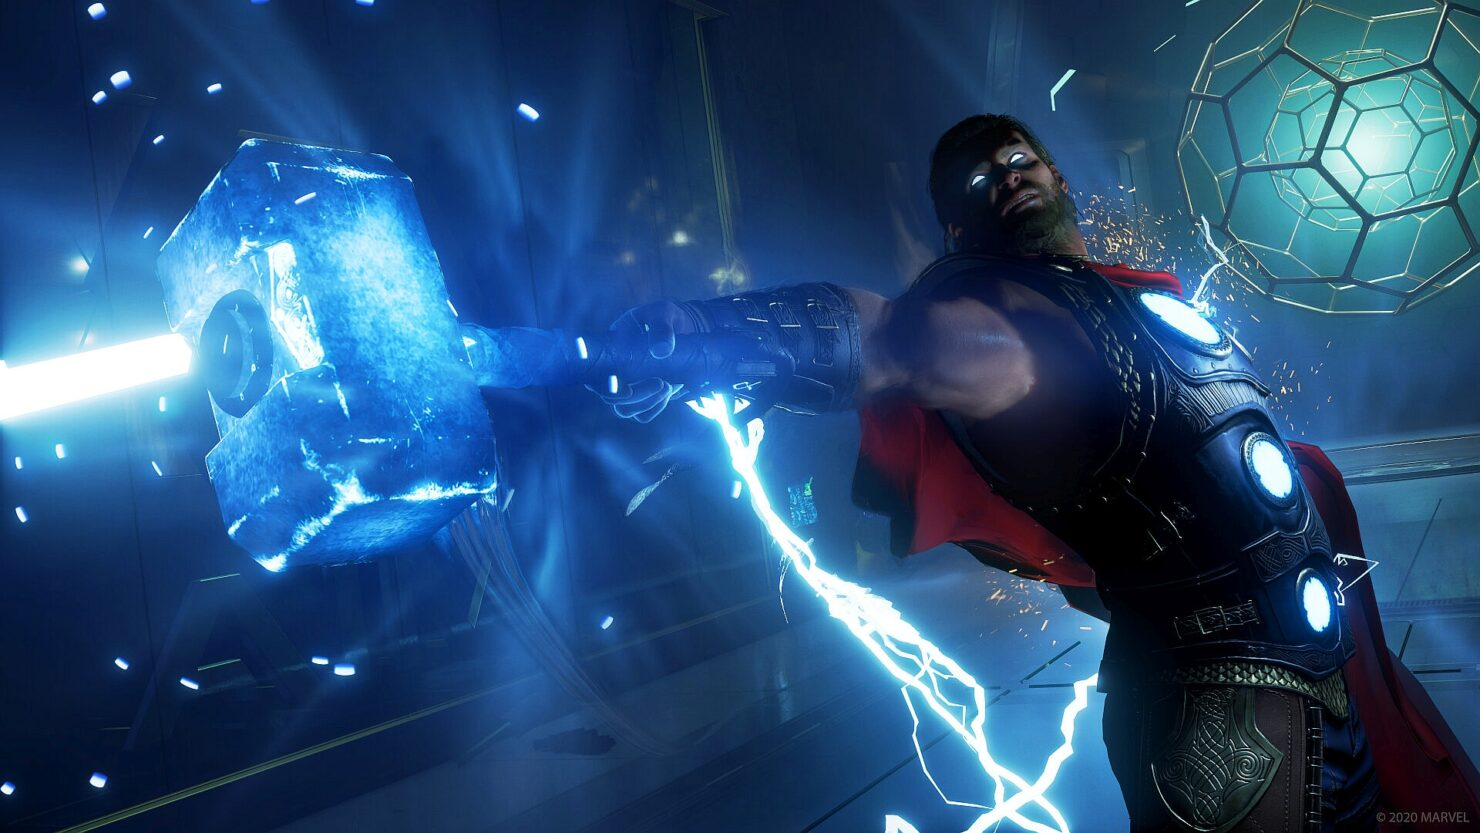 Marvel's Avengers PS5 next-gen features